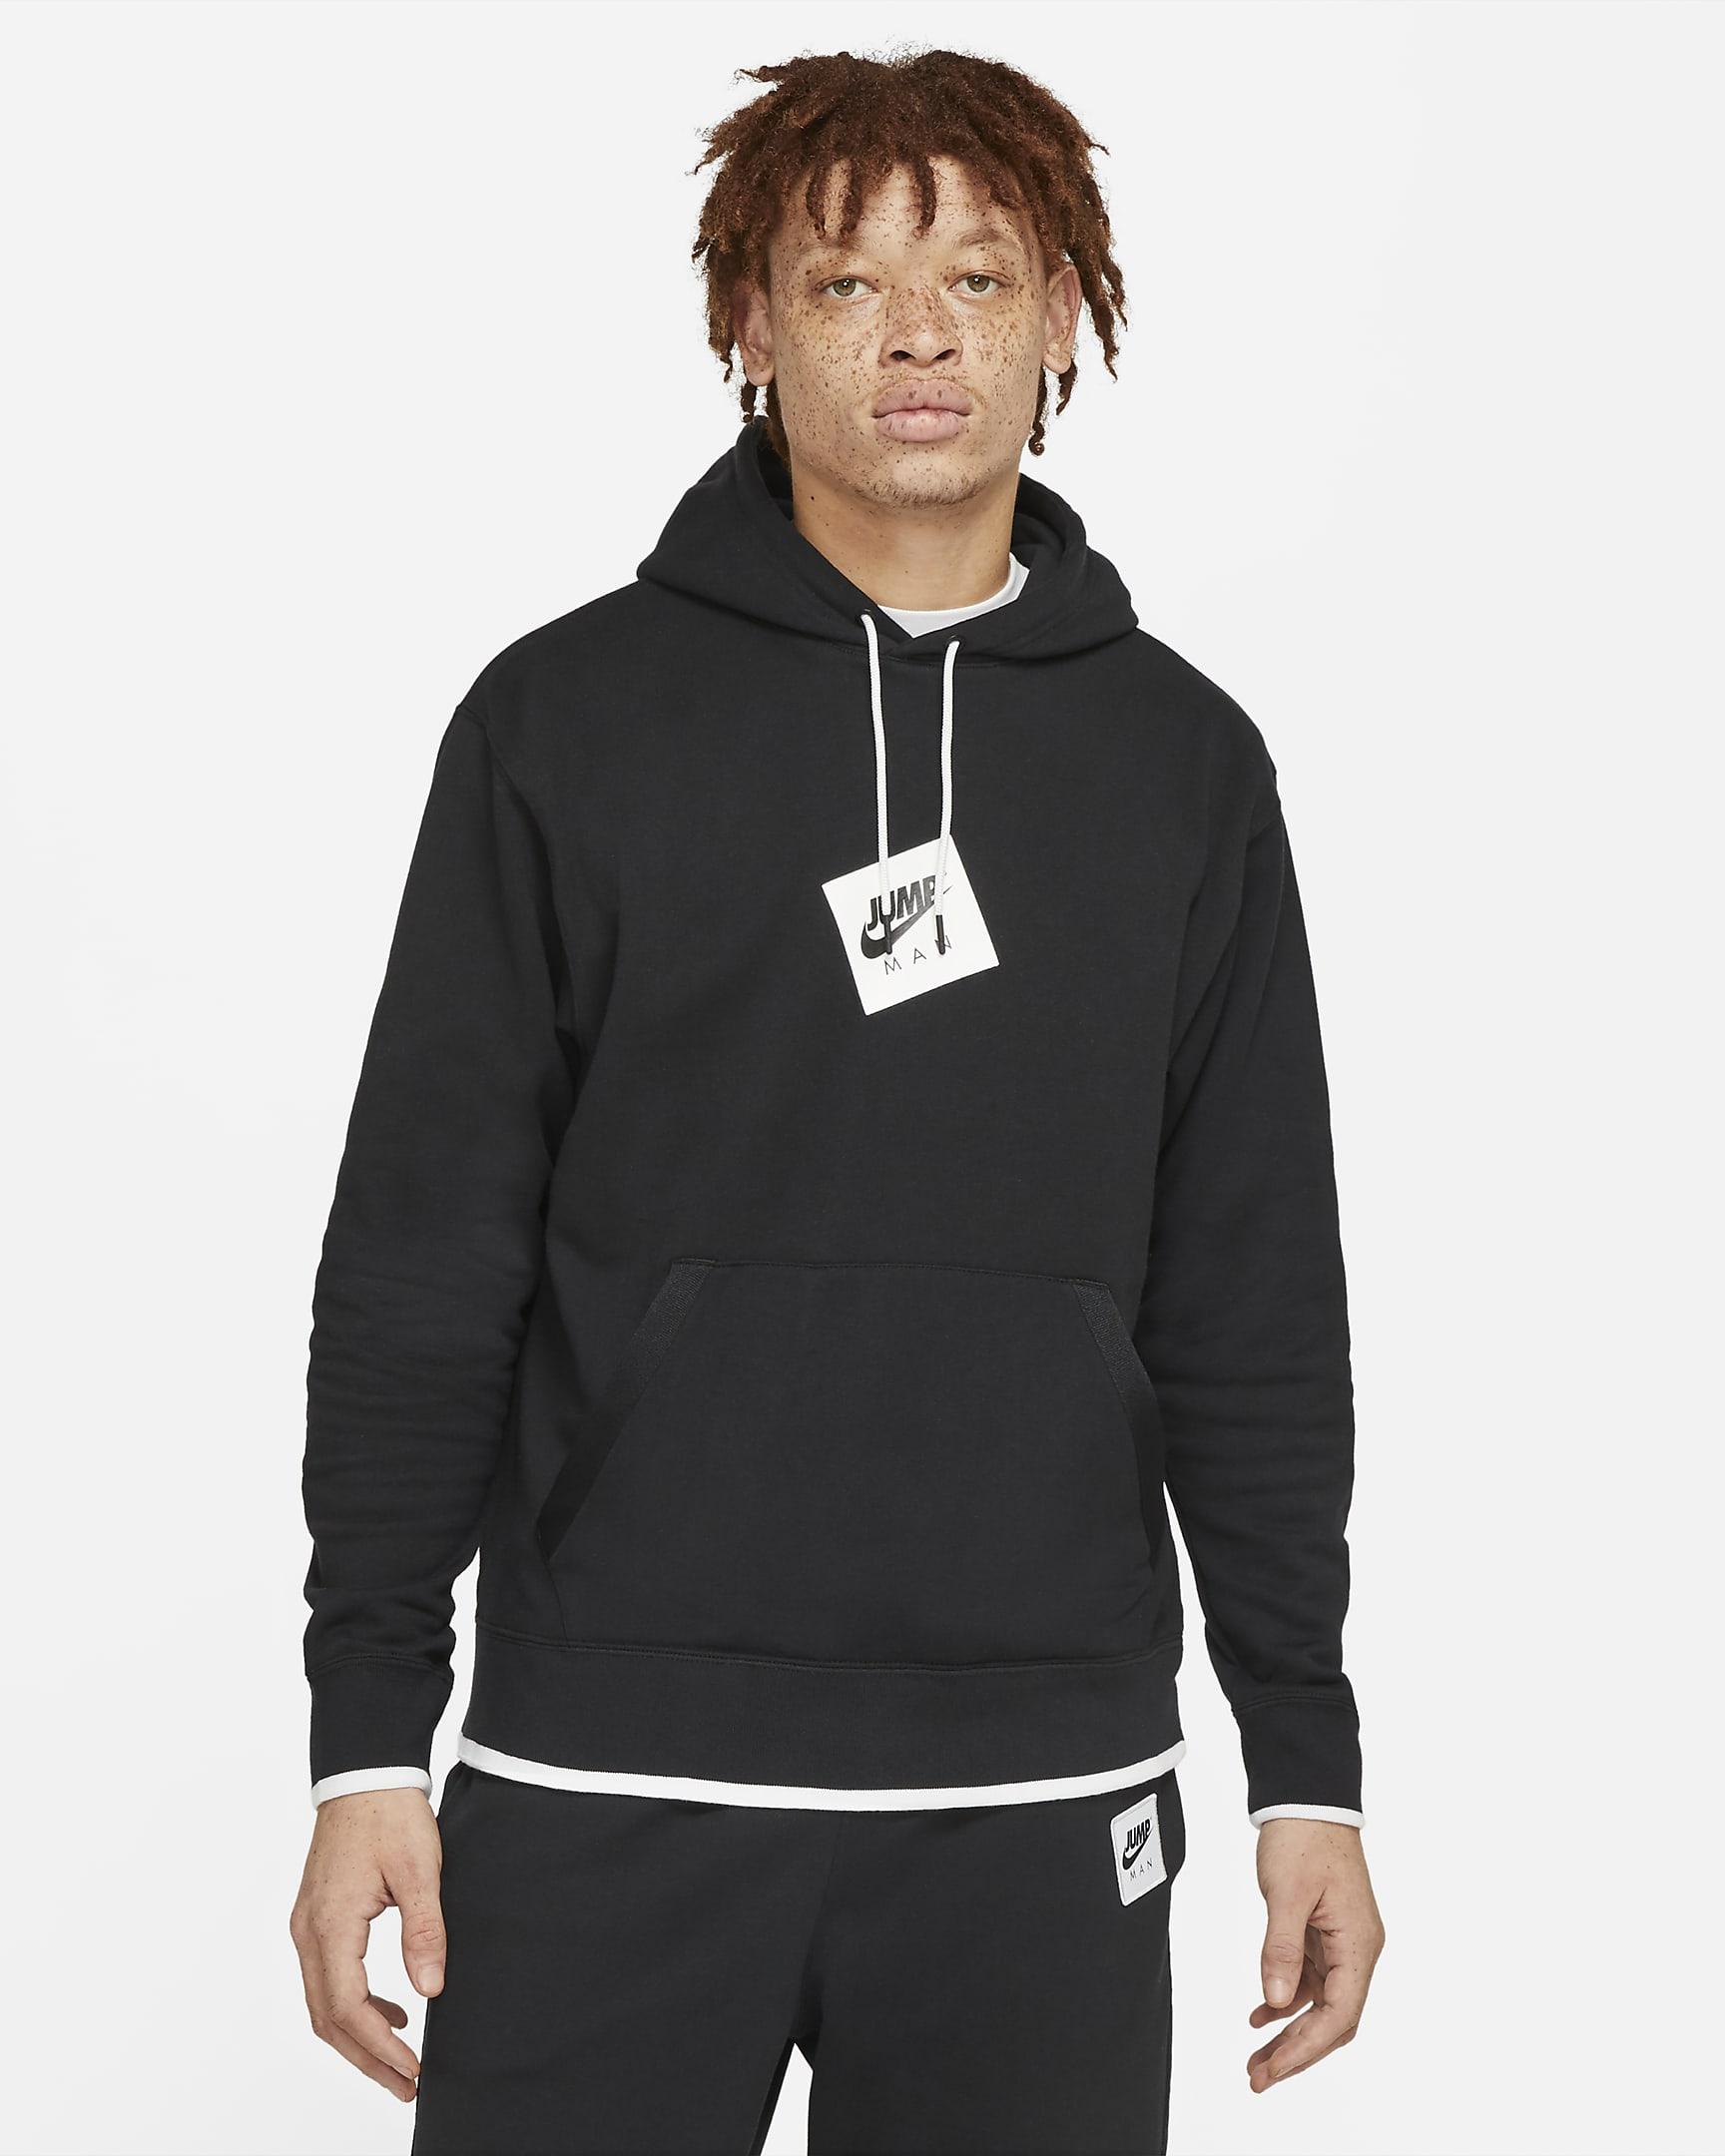 jordan-jumpman-classics-mens-printed-fleece-pullover-hoodie-hz0Q9t-8